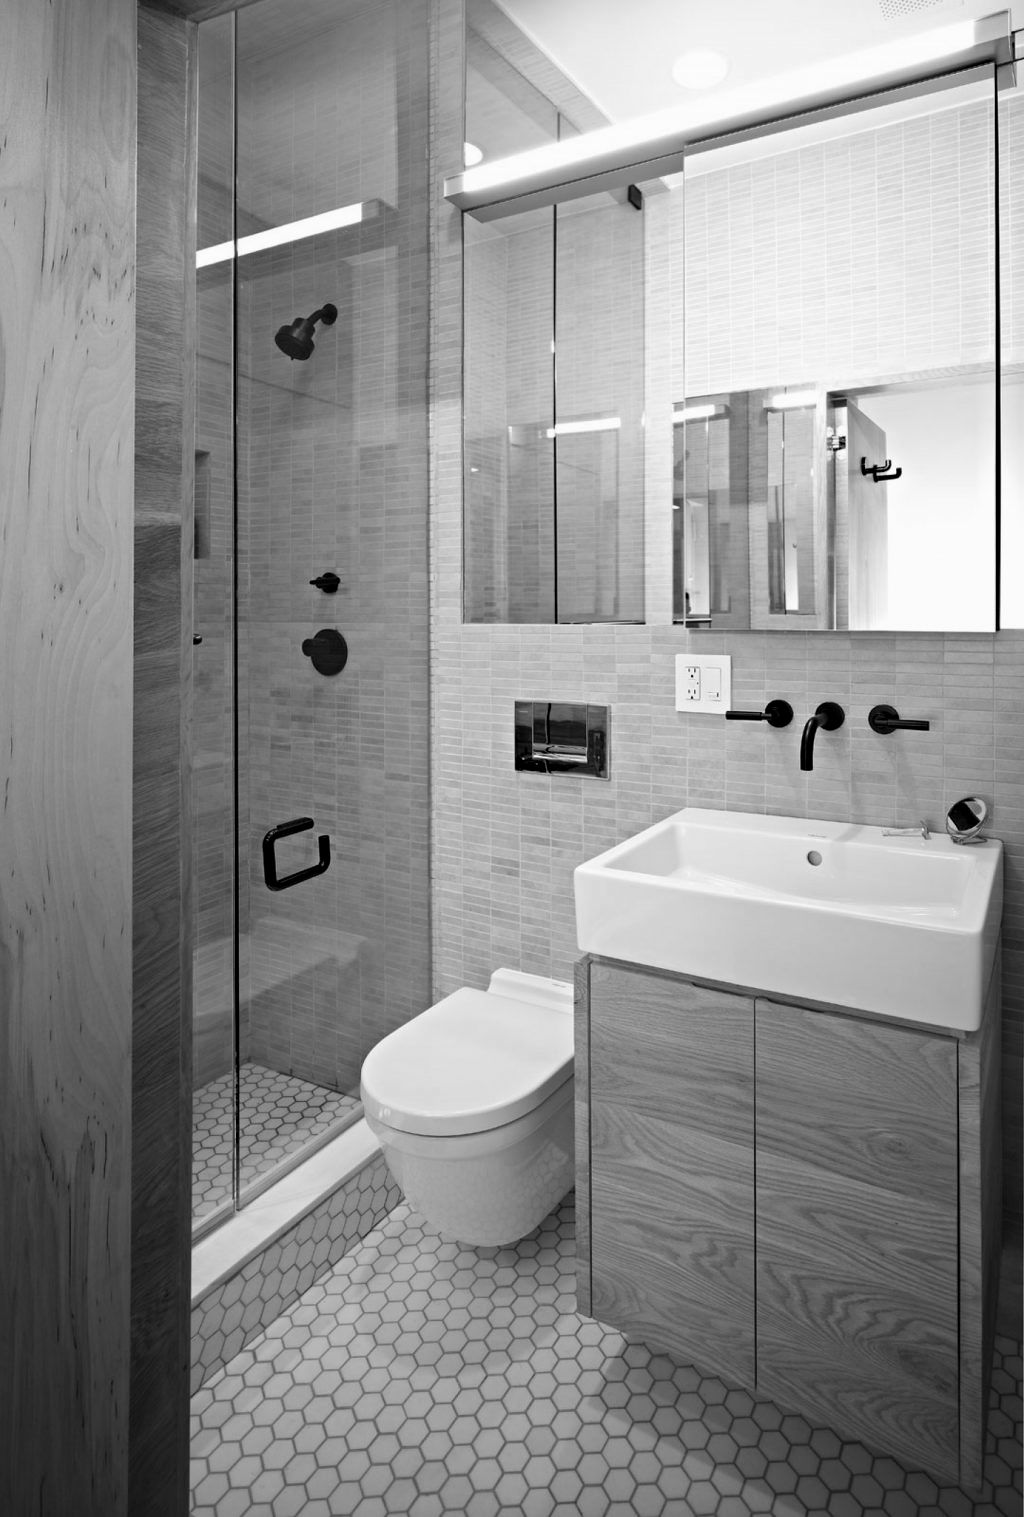 incredible kohler bathroom faucets concept-Elegant Kohler Bathroom Faucets Photograph